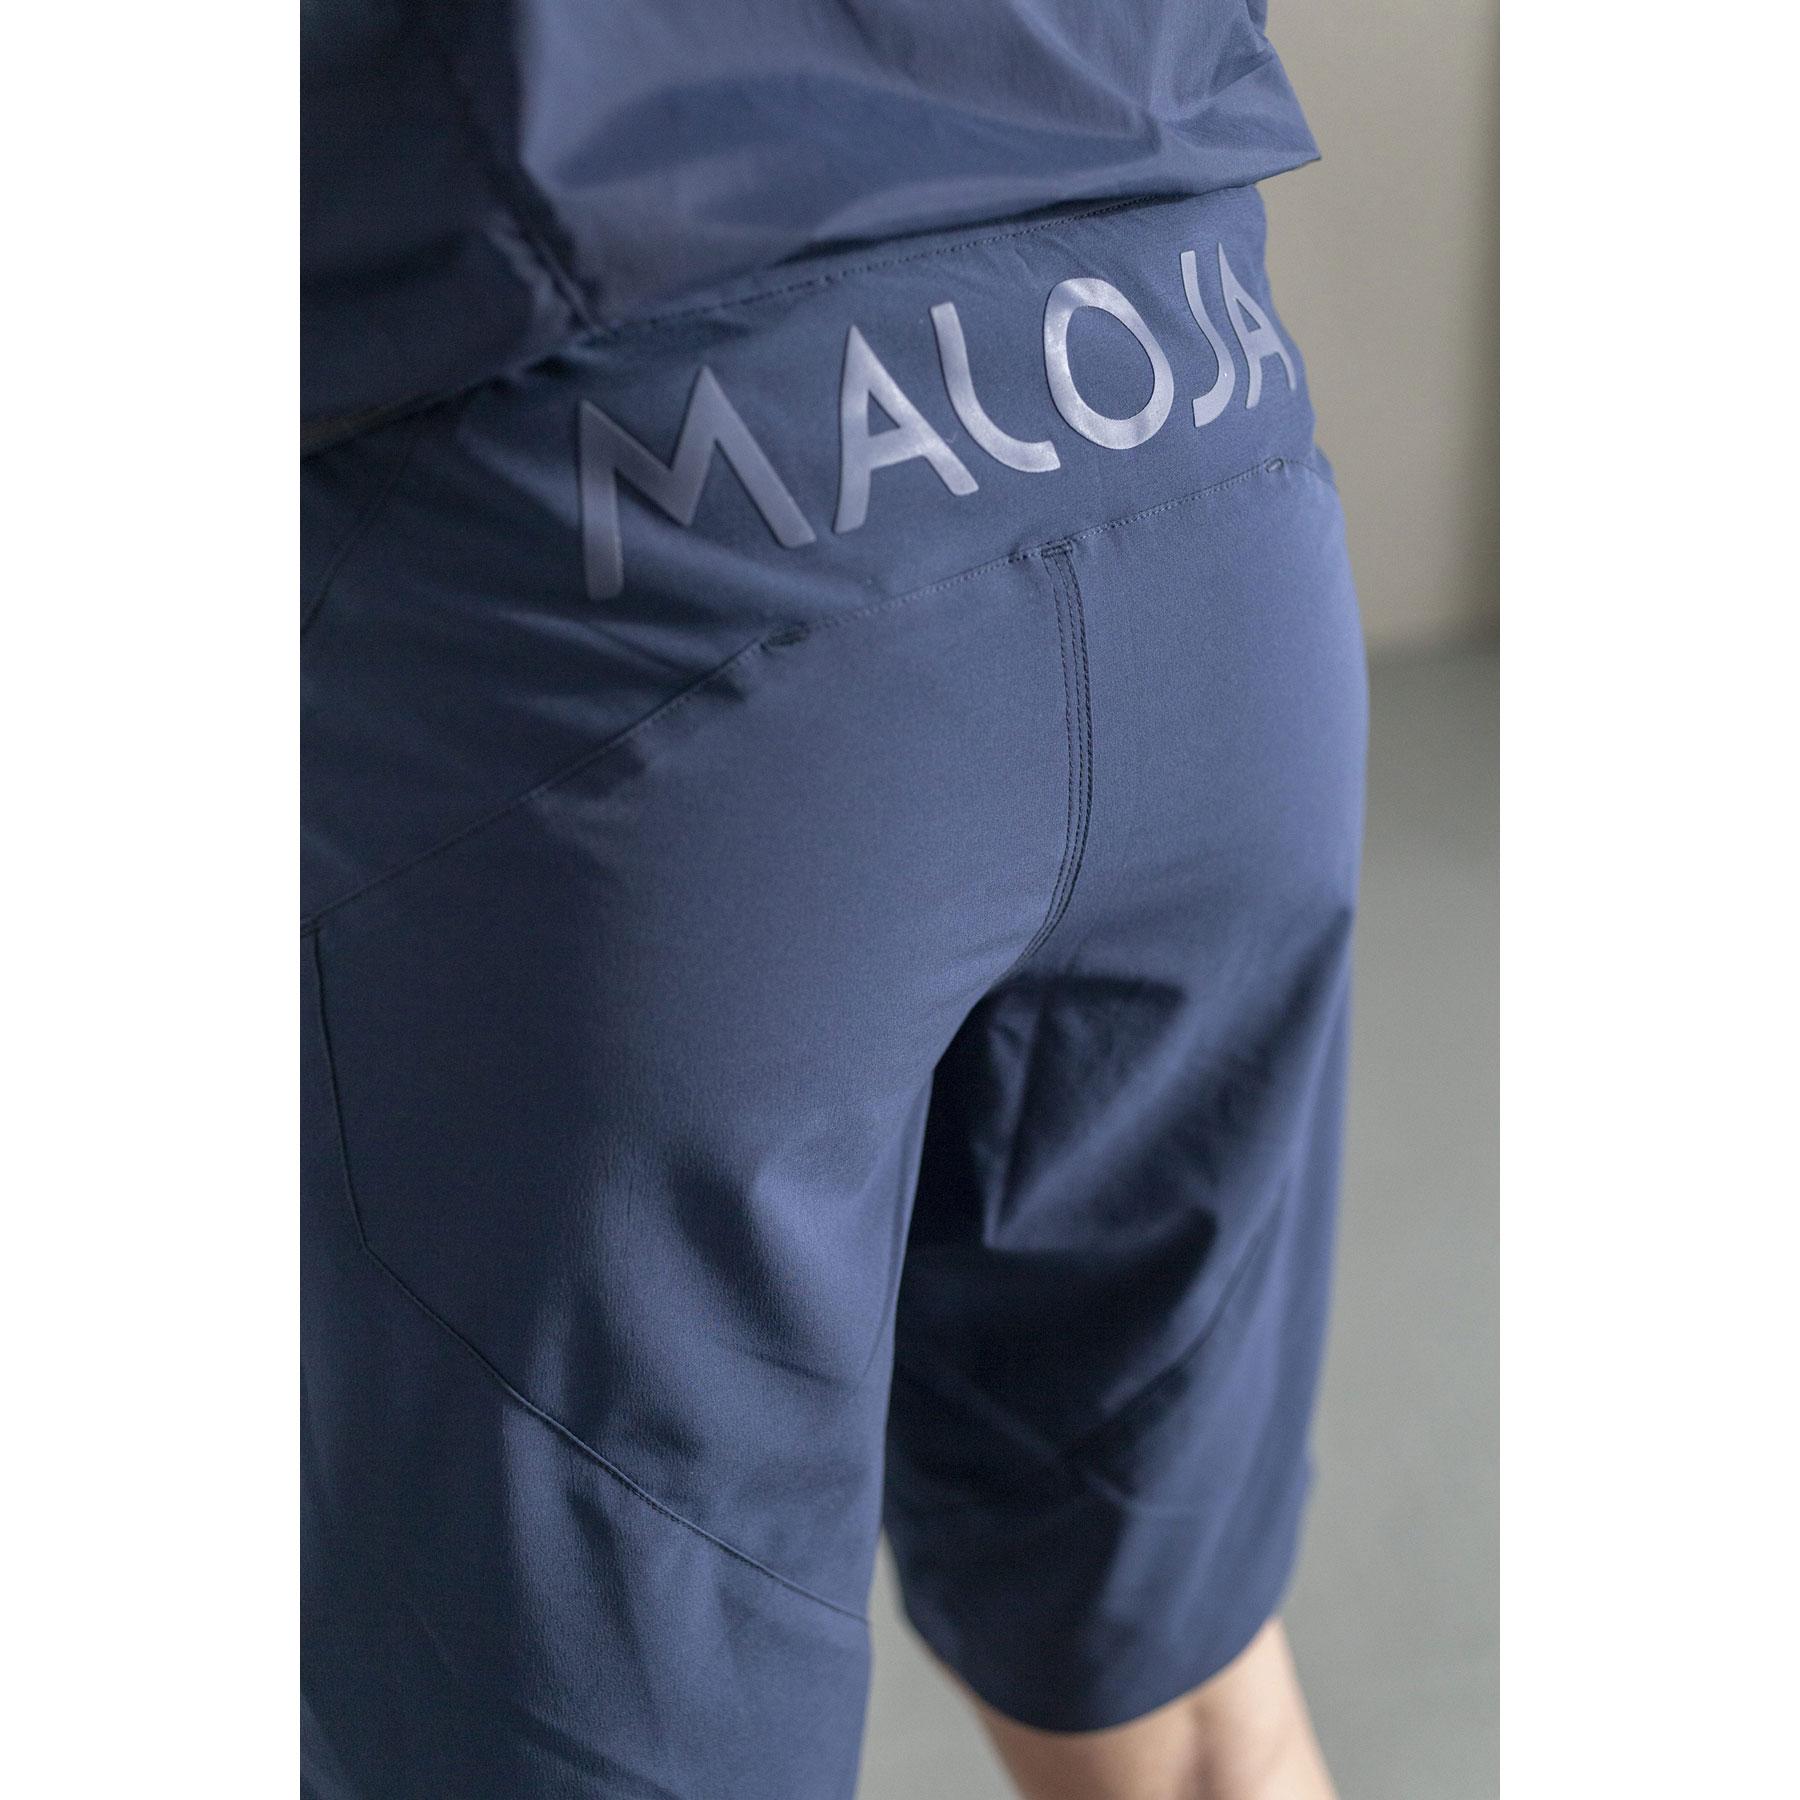 Man wearing Maloja multisport shorts.